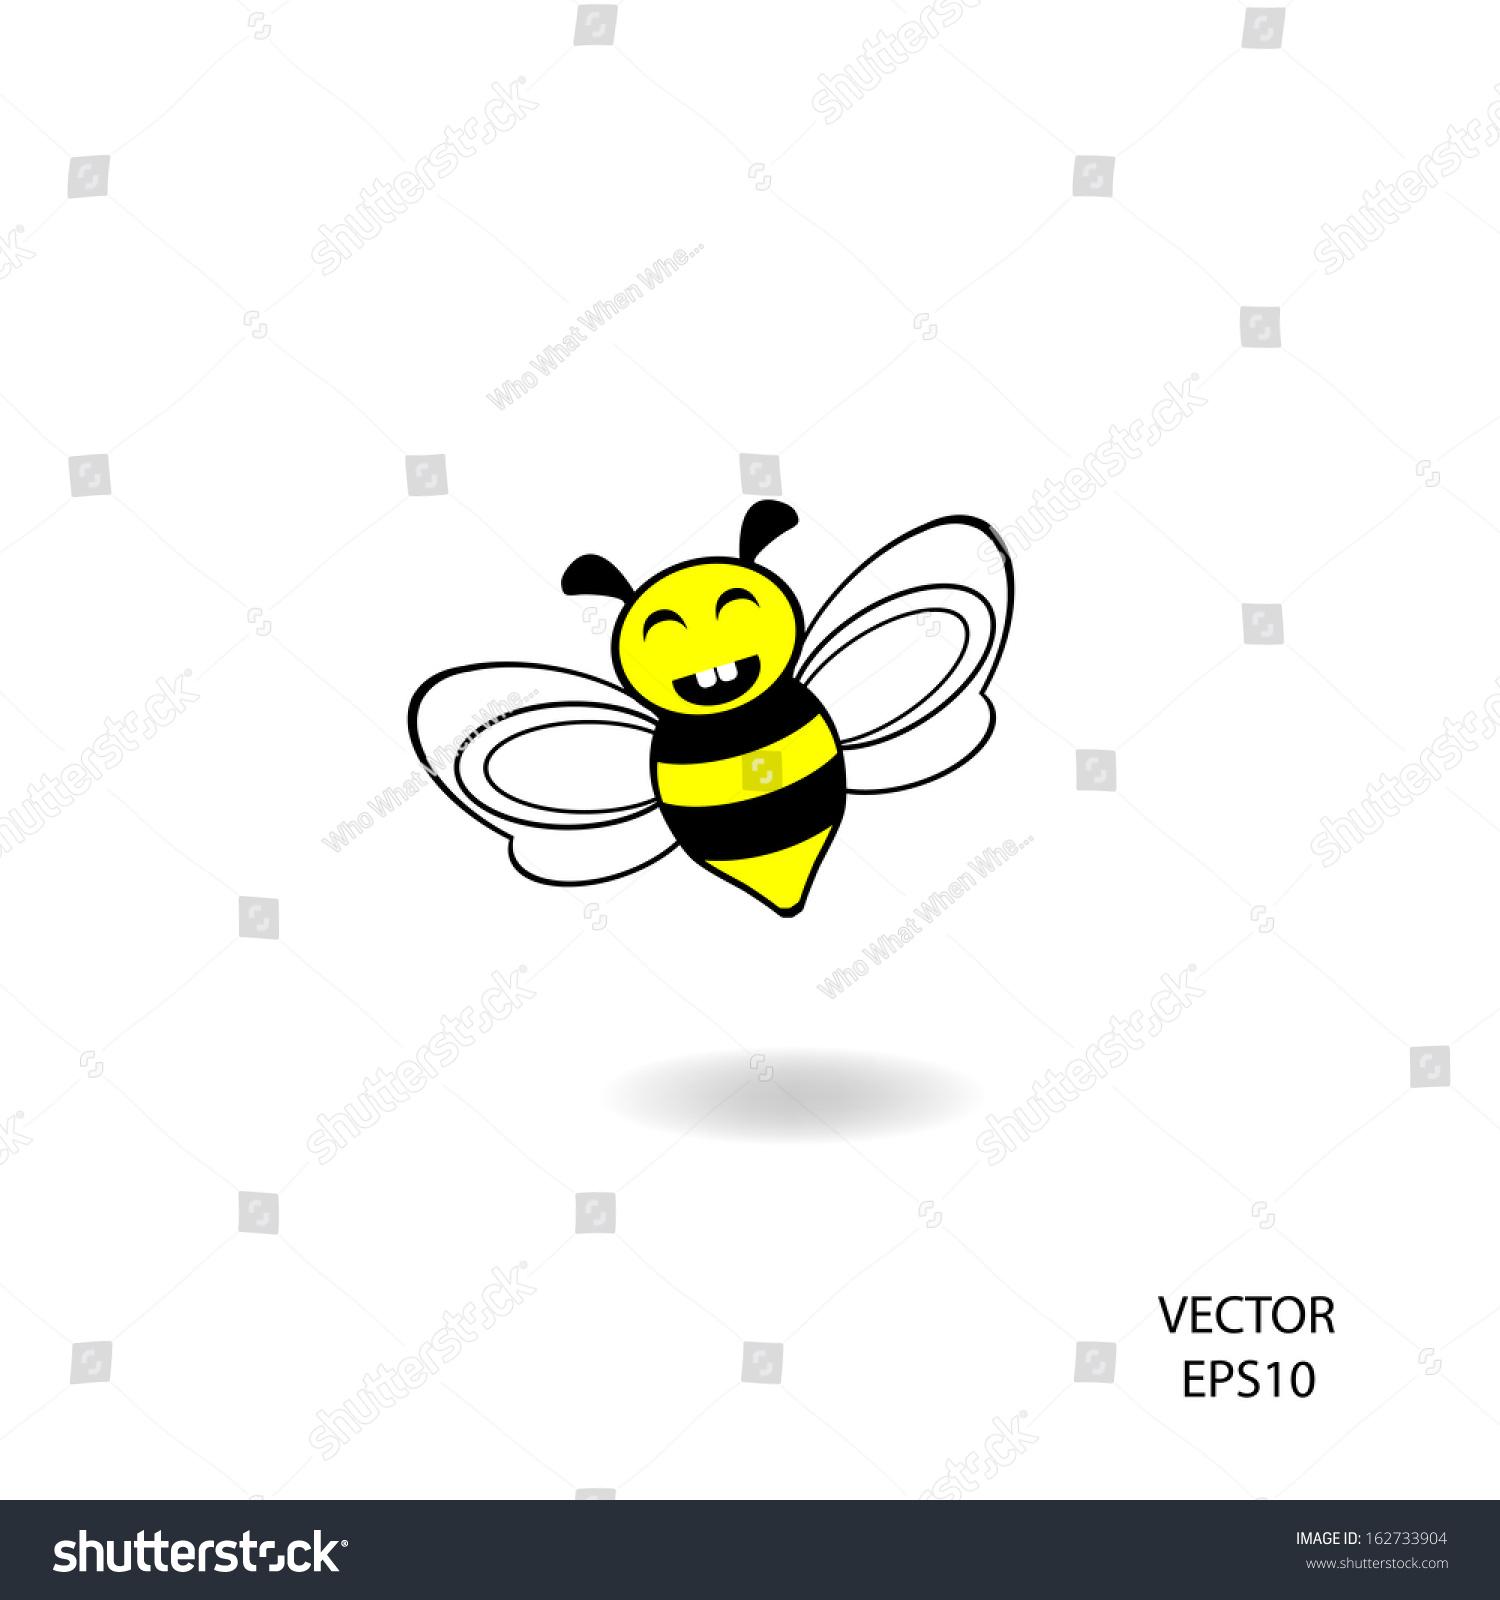 bee iconvectorbee drawing stock vector 162733904 shutterstock